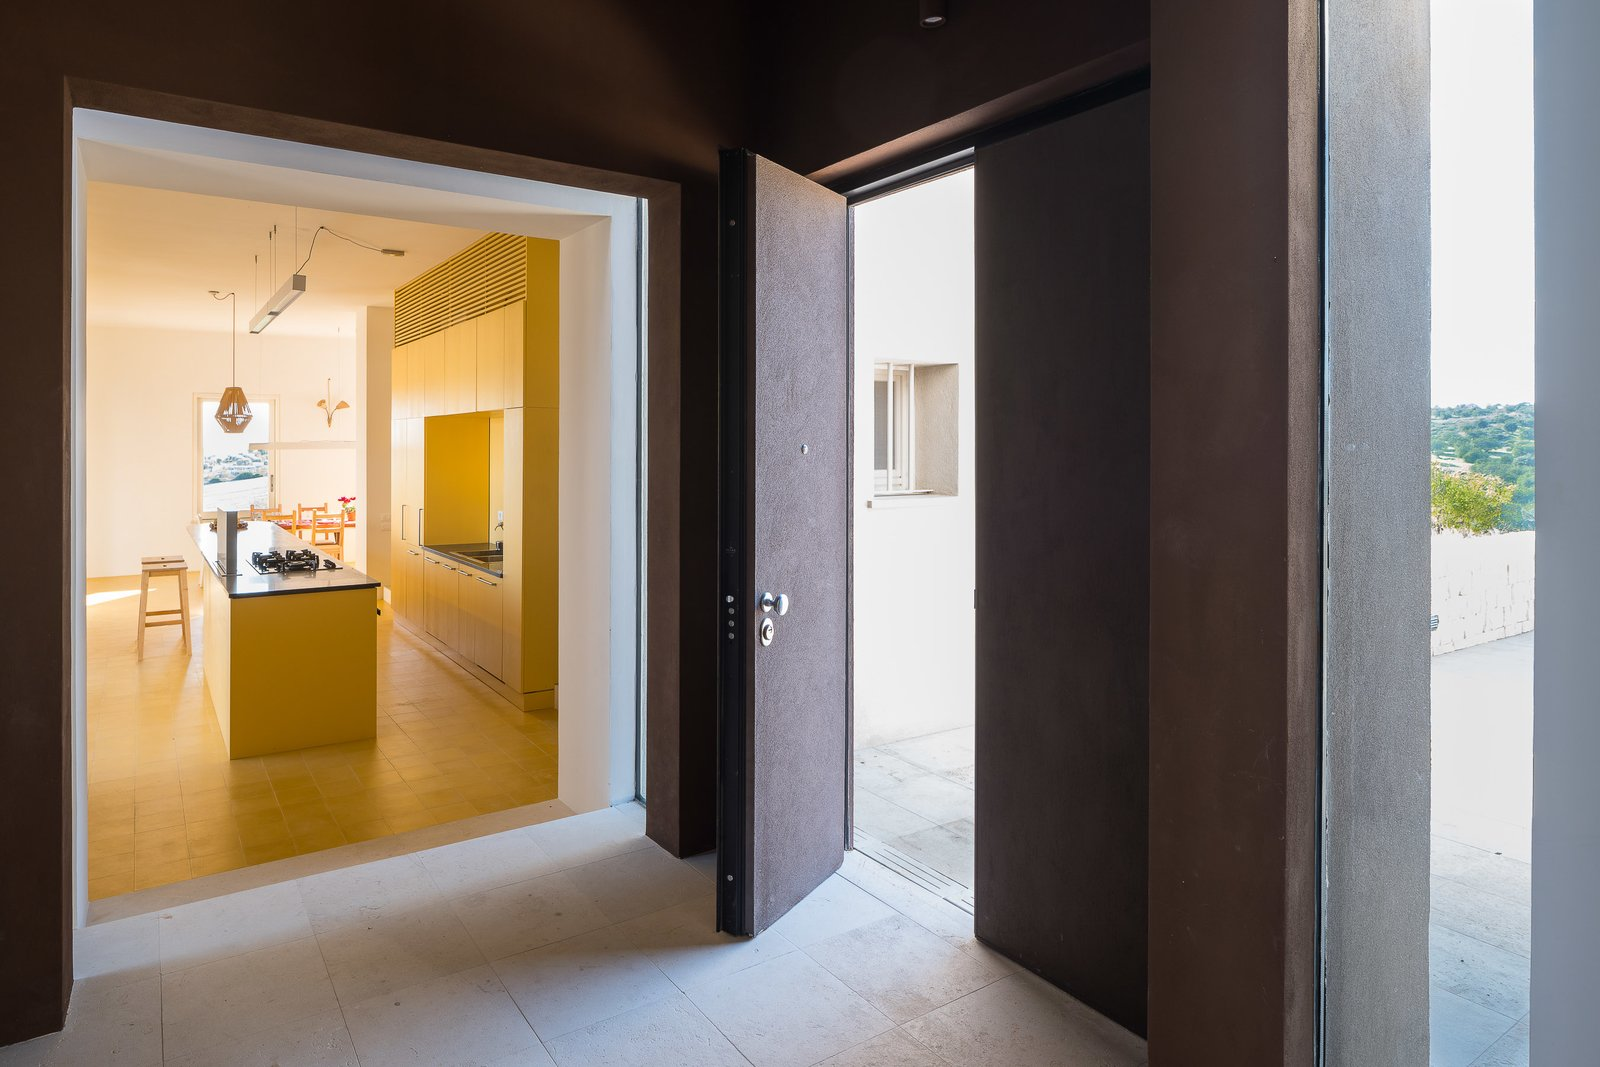 Hallway and Limestone Floor  Cozzo Coniglio